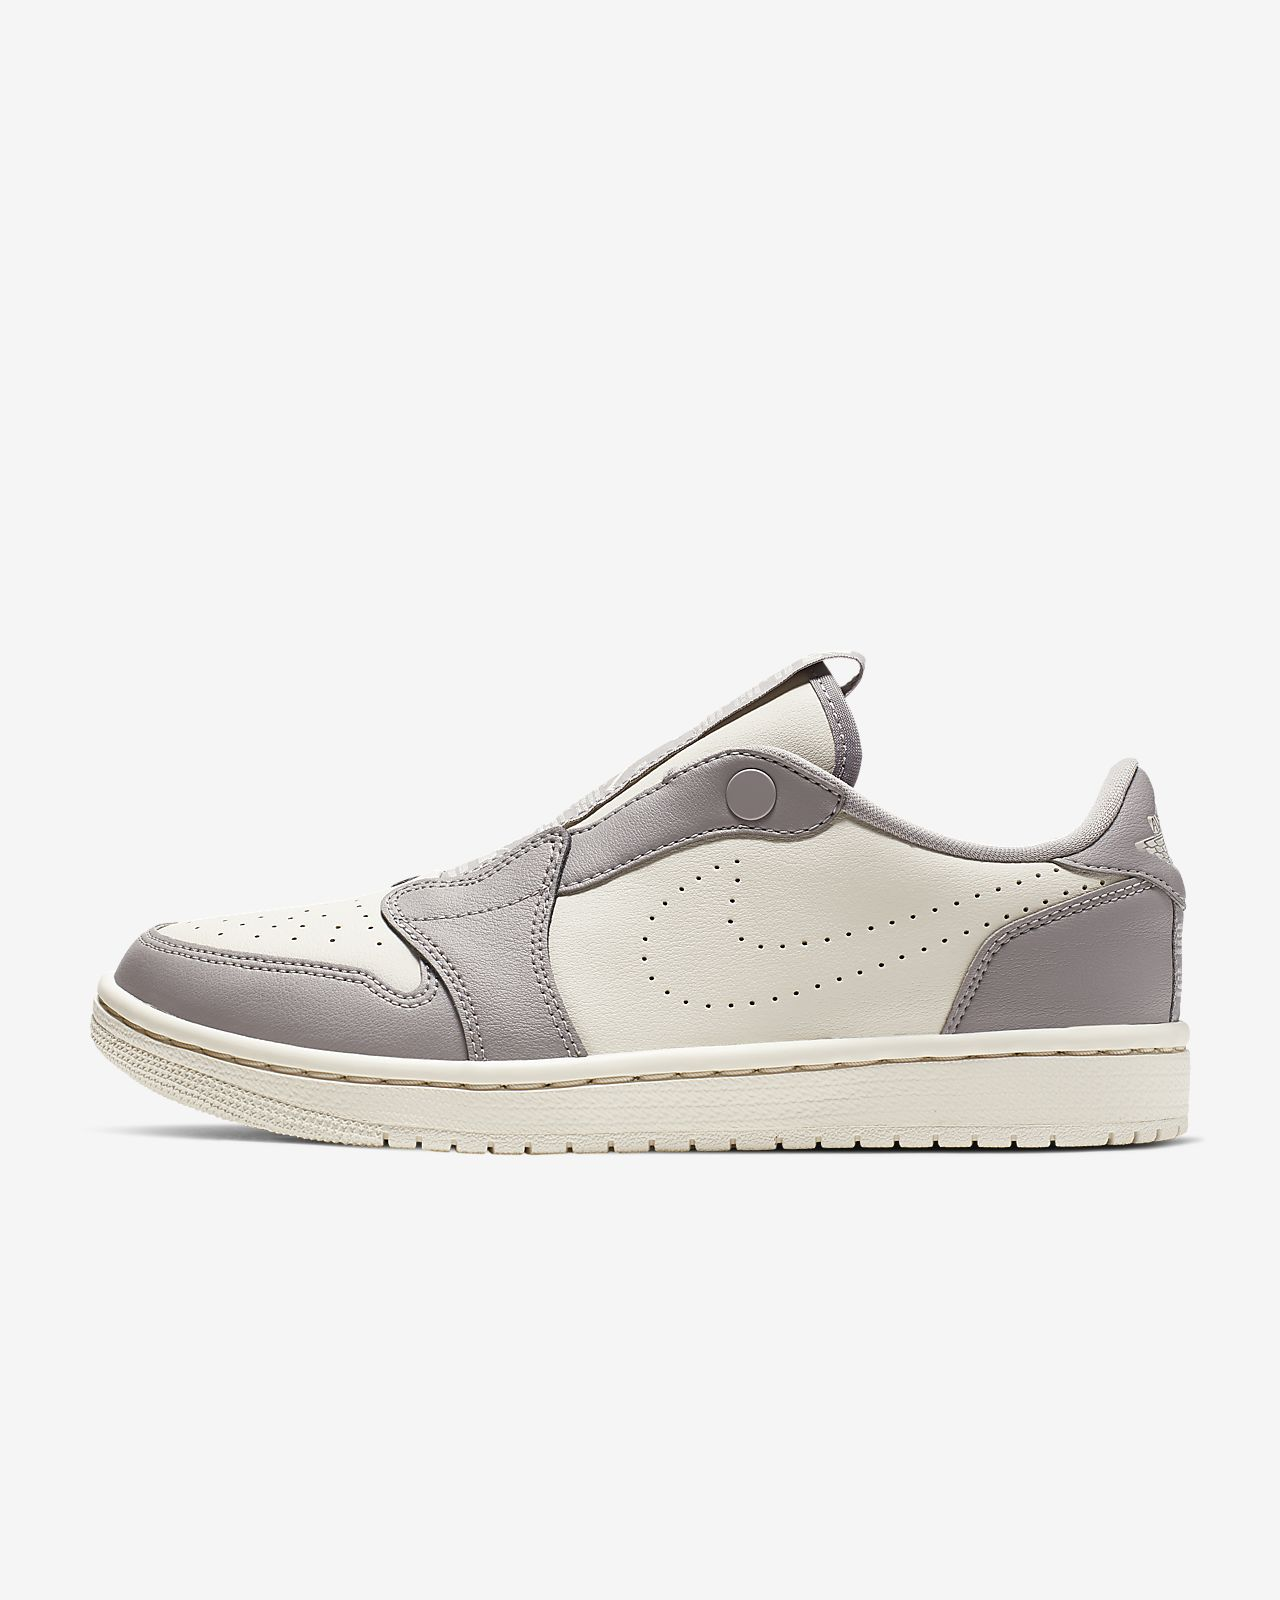 Sapatilhas Air Jordan 1 Retro Low Slip para mulher